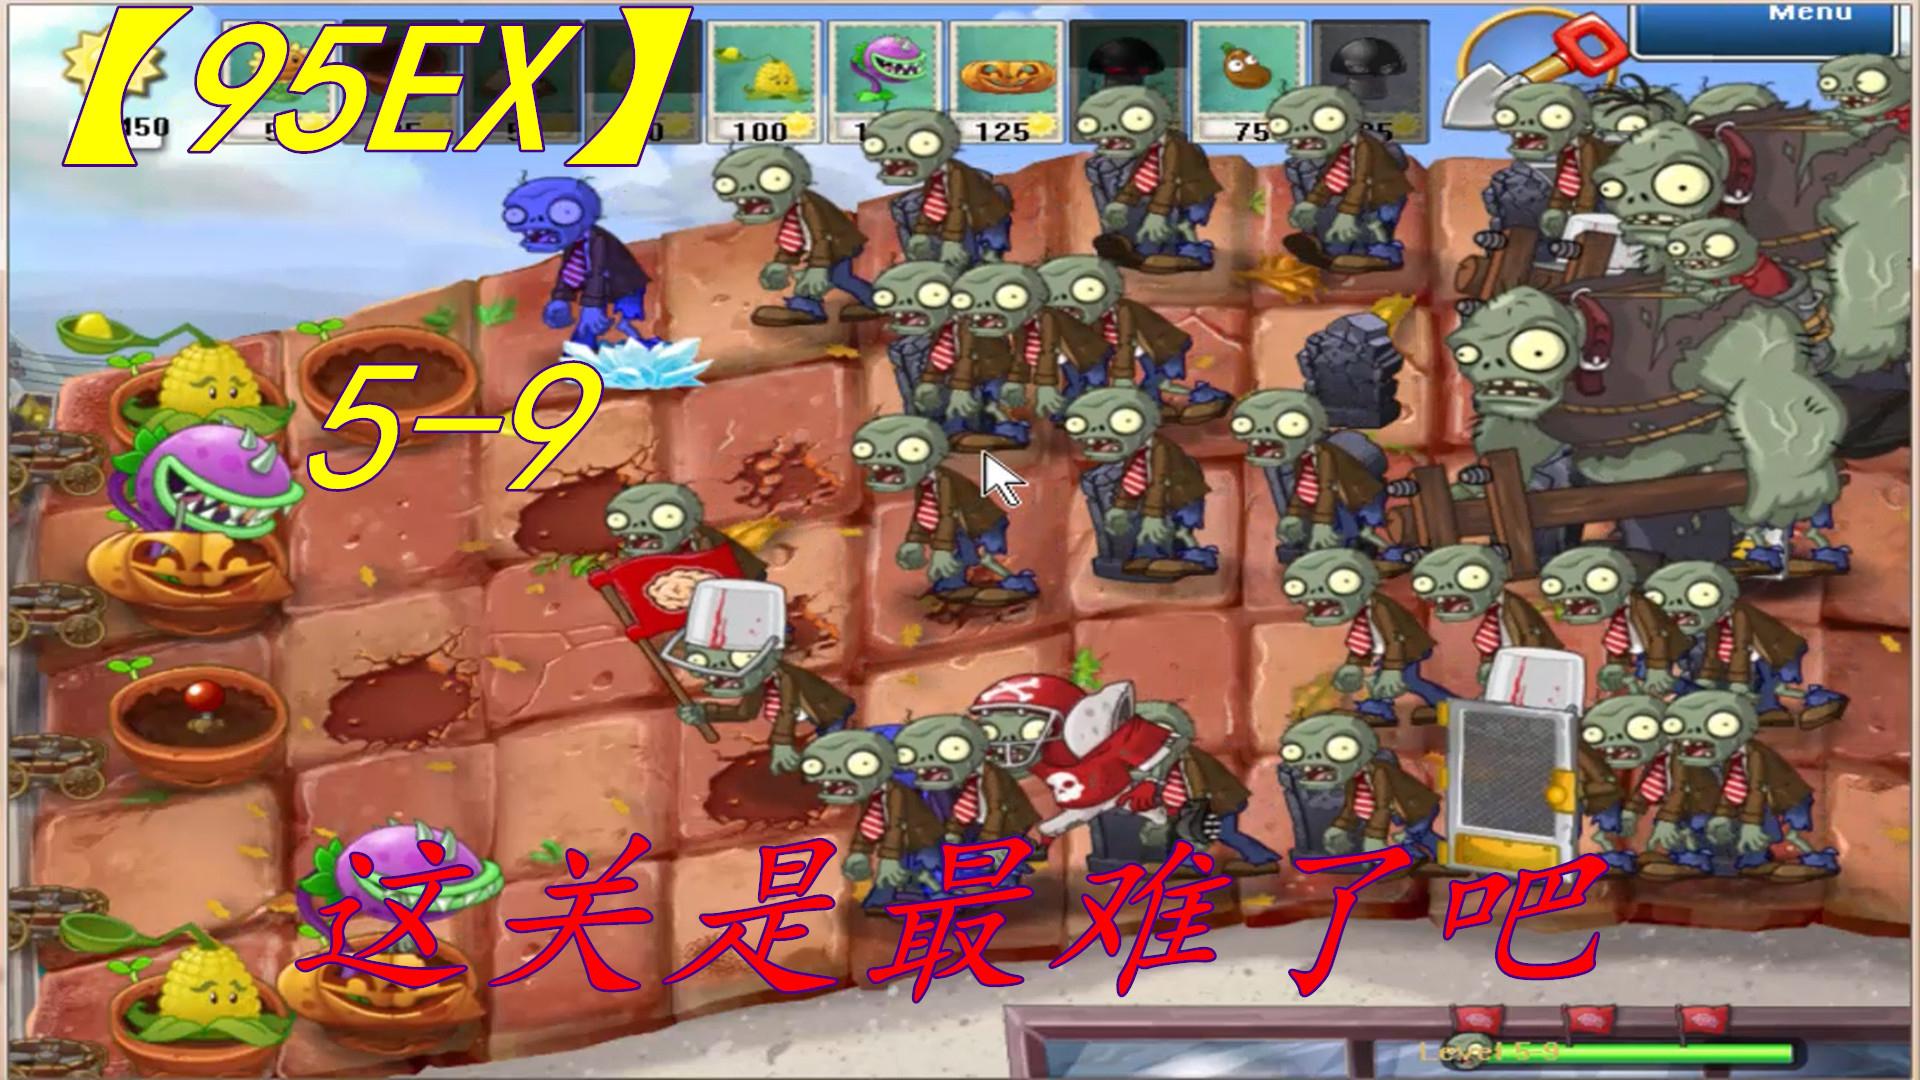 【95EX】5-9感觉是95里最难的一关了吧